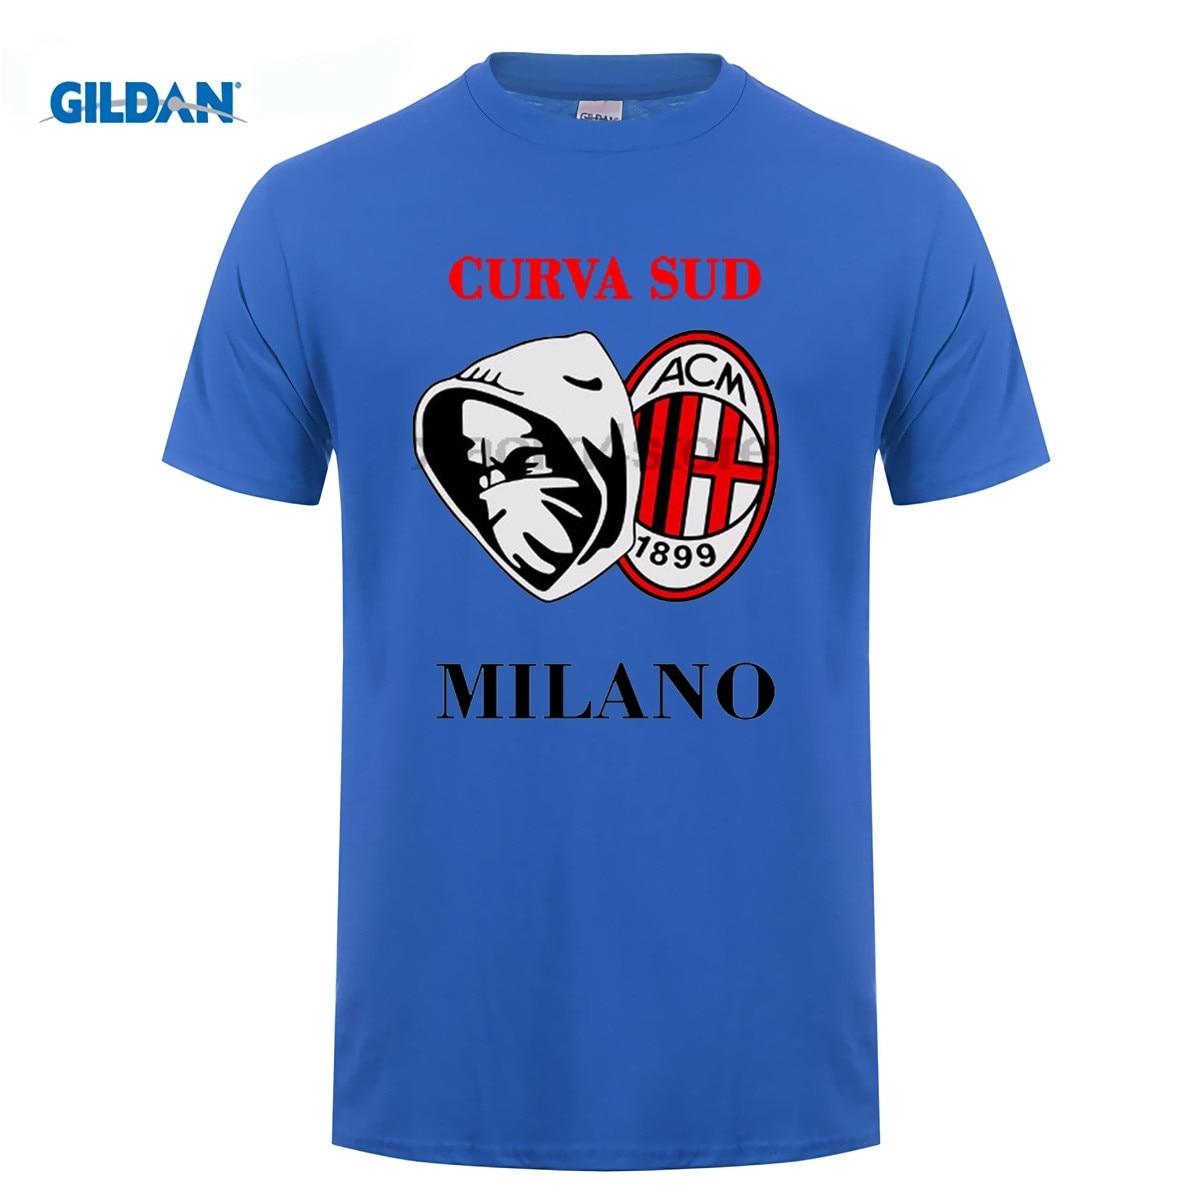 GILDAN DIY style mens t shirts Streetwear Clothing HAPPINESS REGALO SPORTER ULTRAS MILAN CURVA SUD Tees